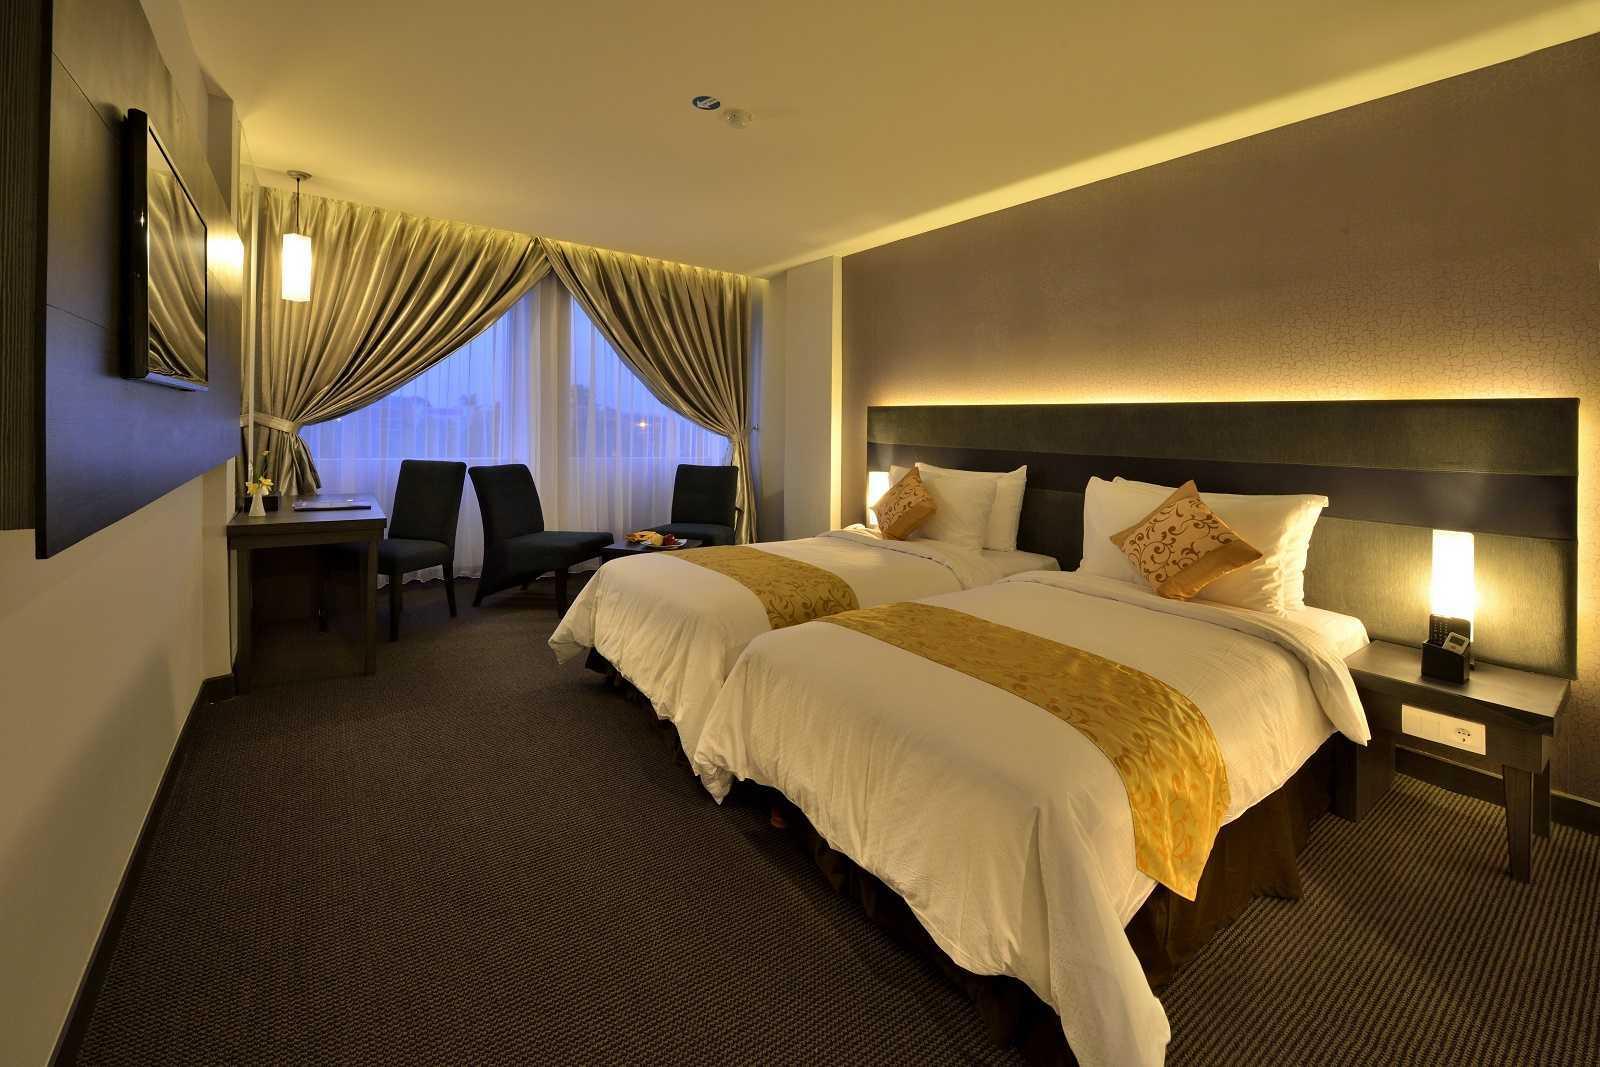 Melly Purnamahildha Tarman Grand Tjokro Pekanbaru Pekanbaru, Riau, Indonesia Pekanbaru, Riau, Indonesia Bedroom Modern Superior Room  (Image: Http://www.grandtjokro.com/hotel-Grand-Tjokro-Pekanbaru-In-Pekanbaru/photos/) 20459